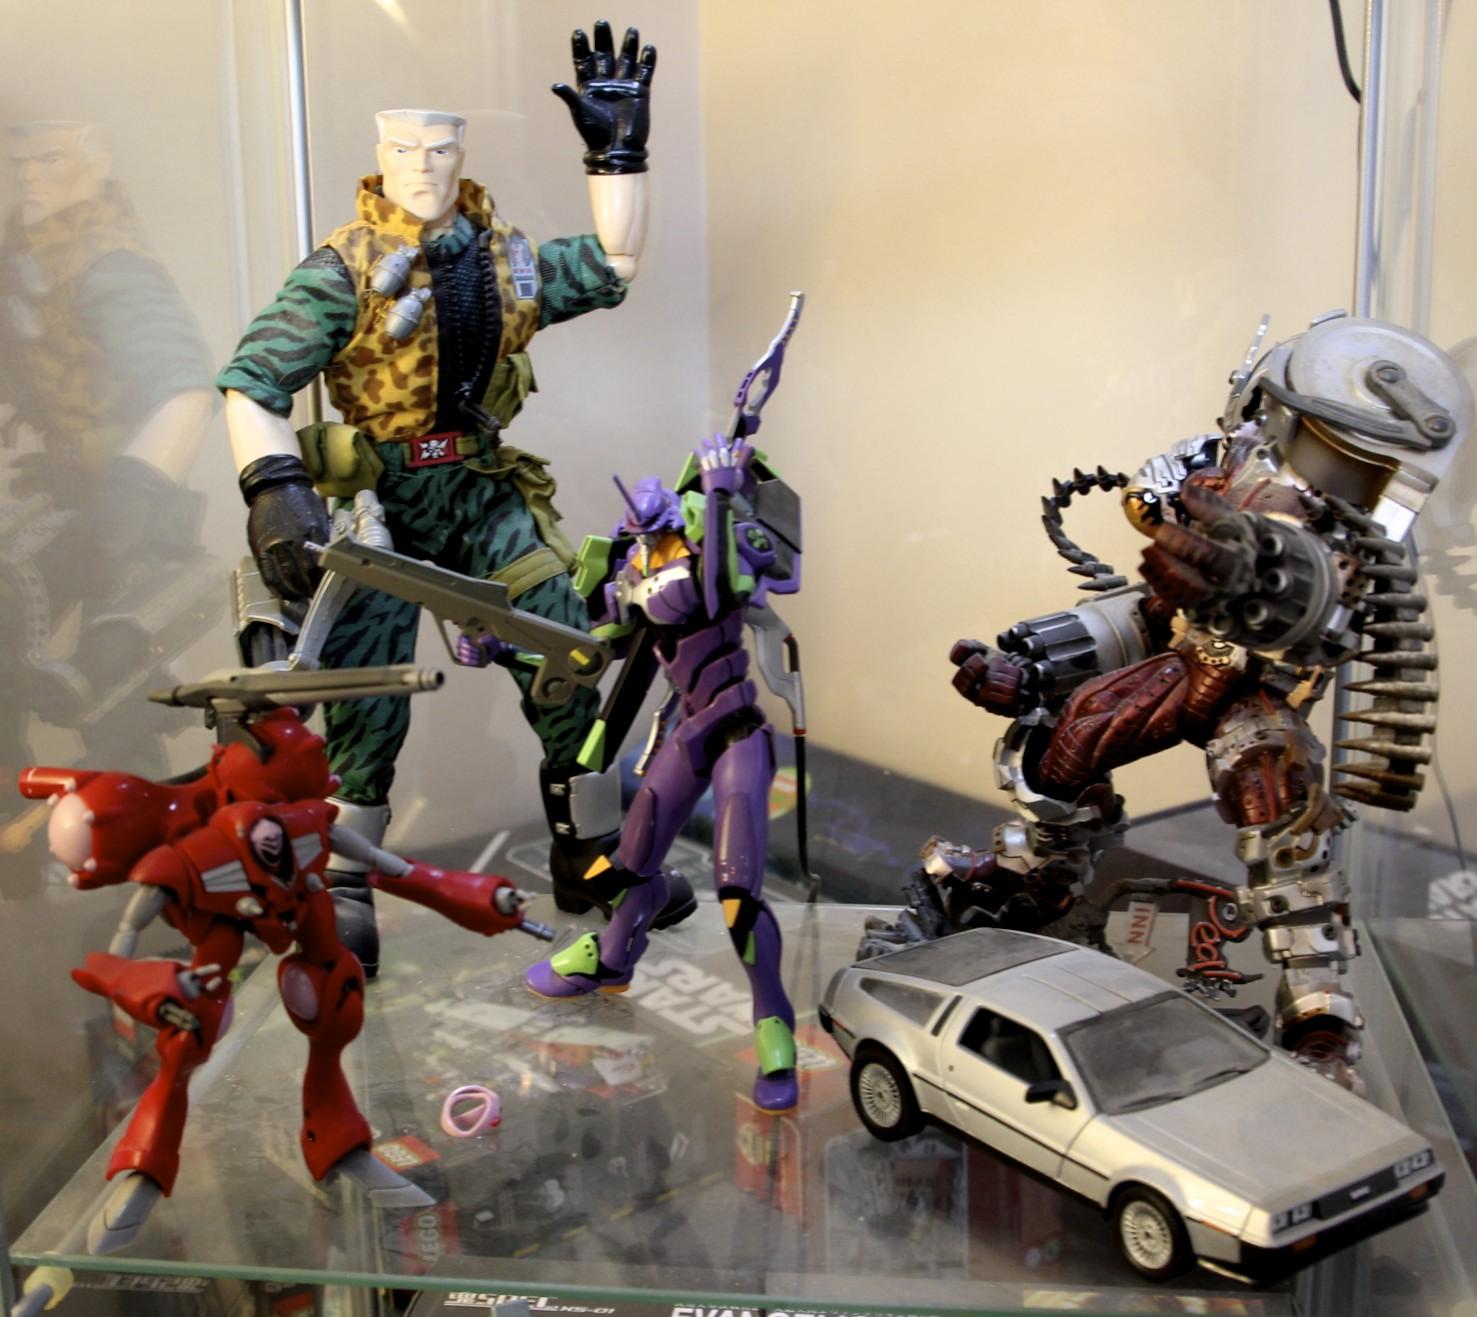 Small Soldiers  Chip Hazzard,   Evangelion   EVA-01, Trigun's Monev the Gale,  Robotech  Queadluun Rau, DeLorean.